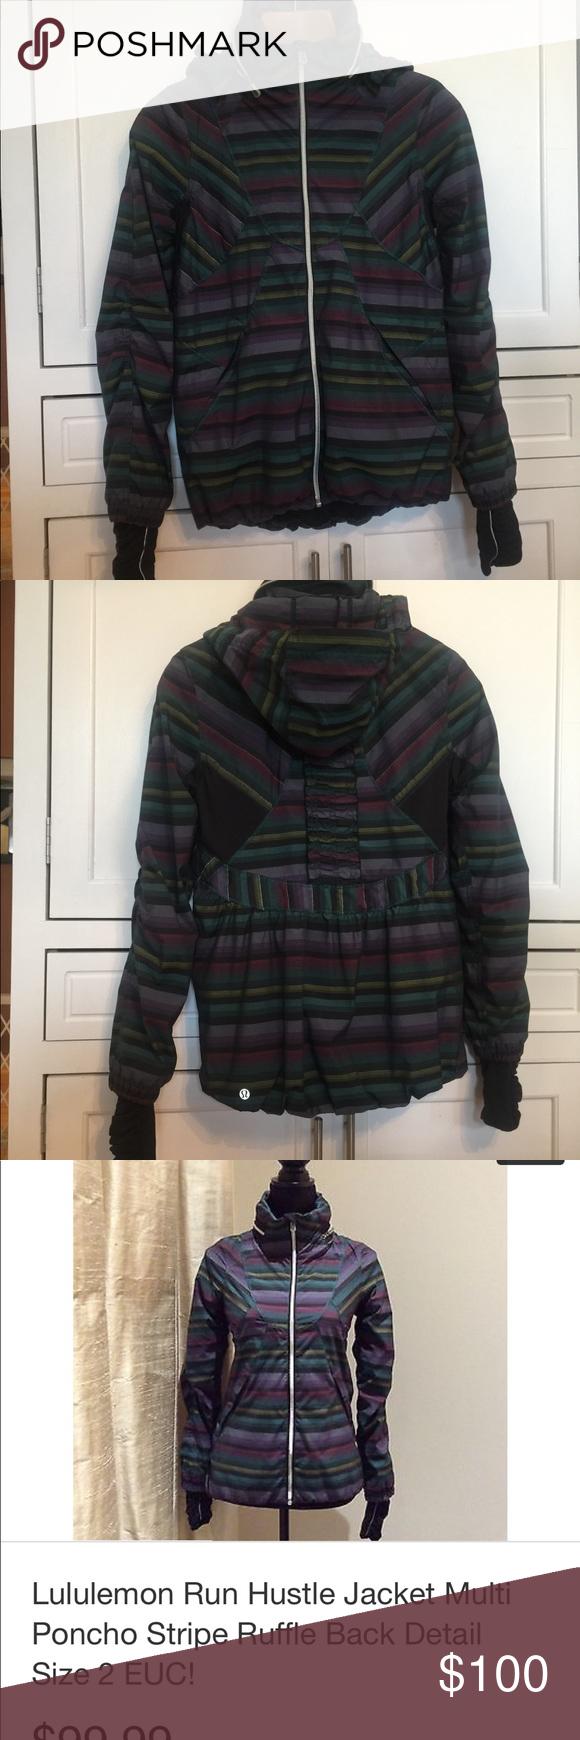 635b665f5b8 Lululemon Run Hustle Jacket Multi stripe, poncho style, ruffle back, stow  away hood, thumb holes, reflective. Great jacket in EUC. lululemon  athletica ...